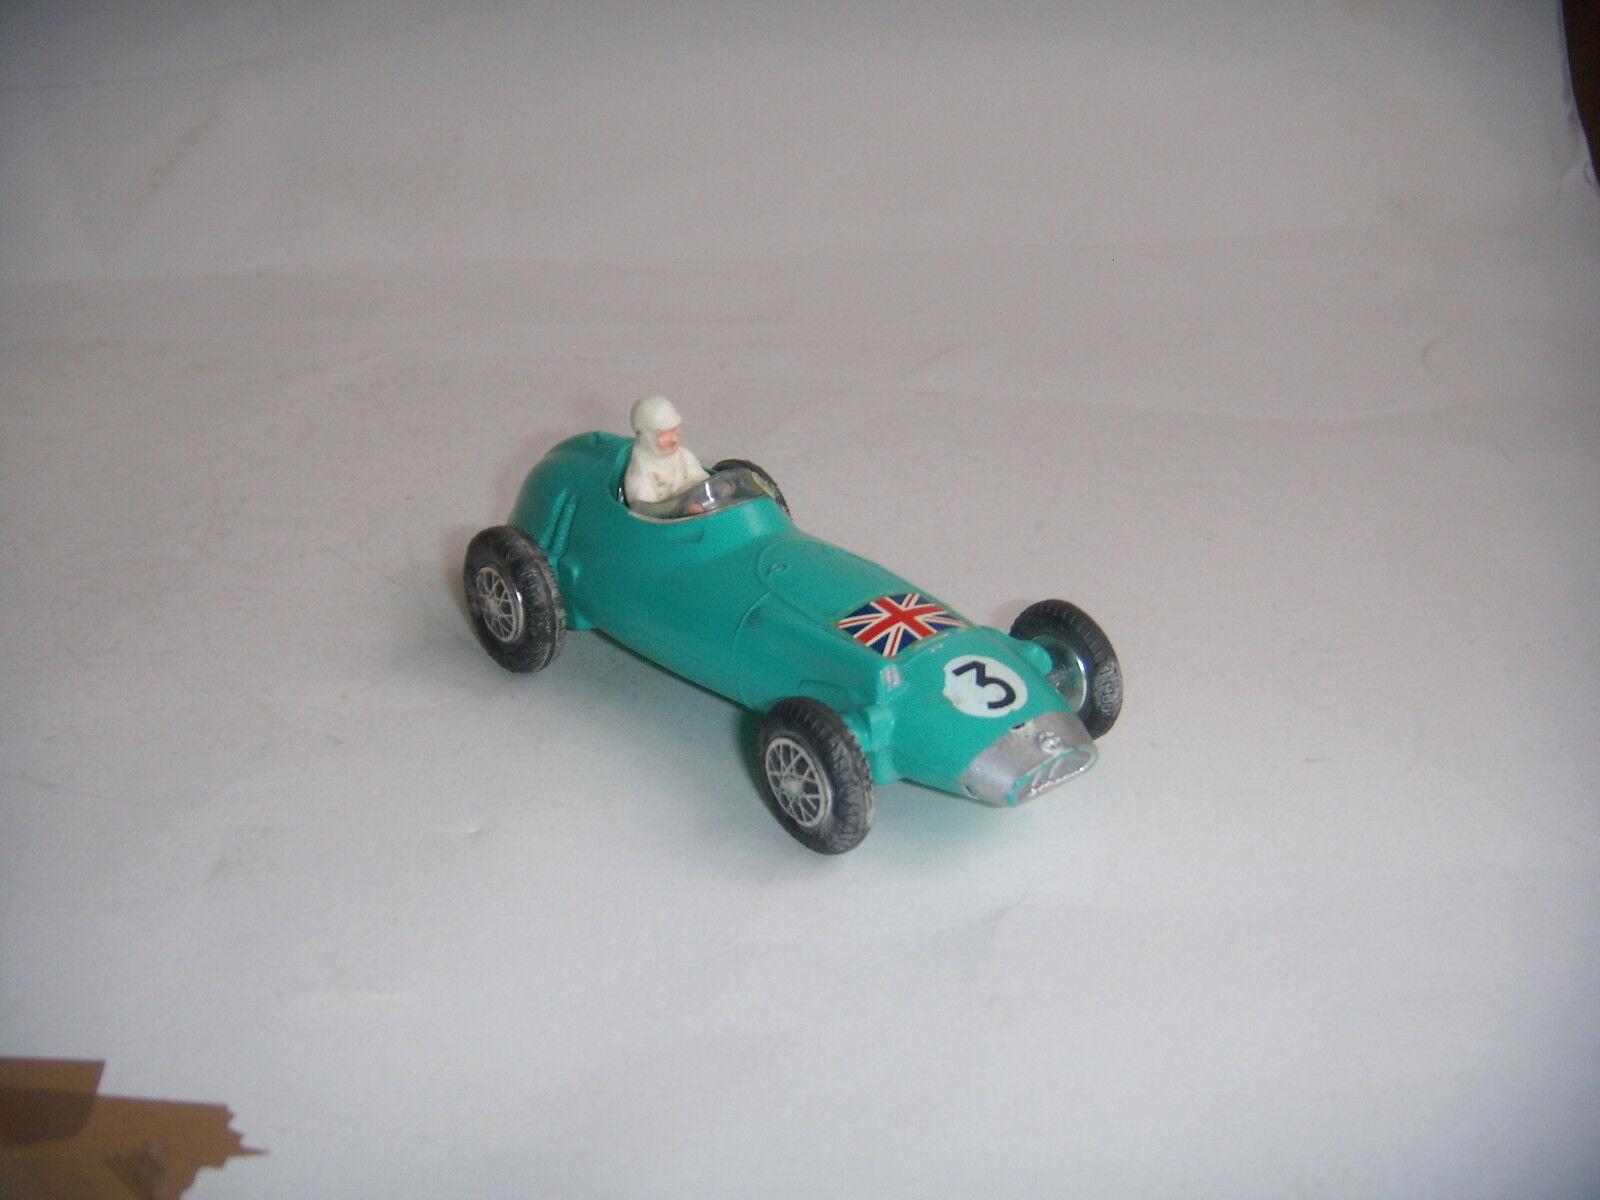 Corgi Toys No. 152s, BRM Formula 1 Grand Prix Racing Racing Racing Car, - Superb 336f01